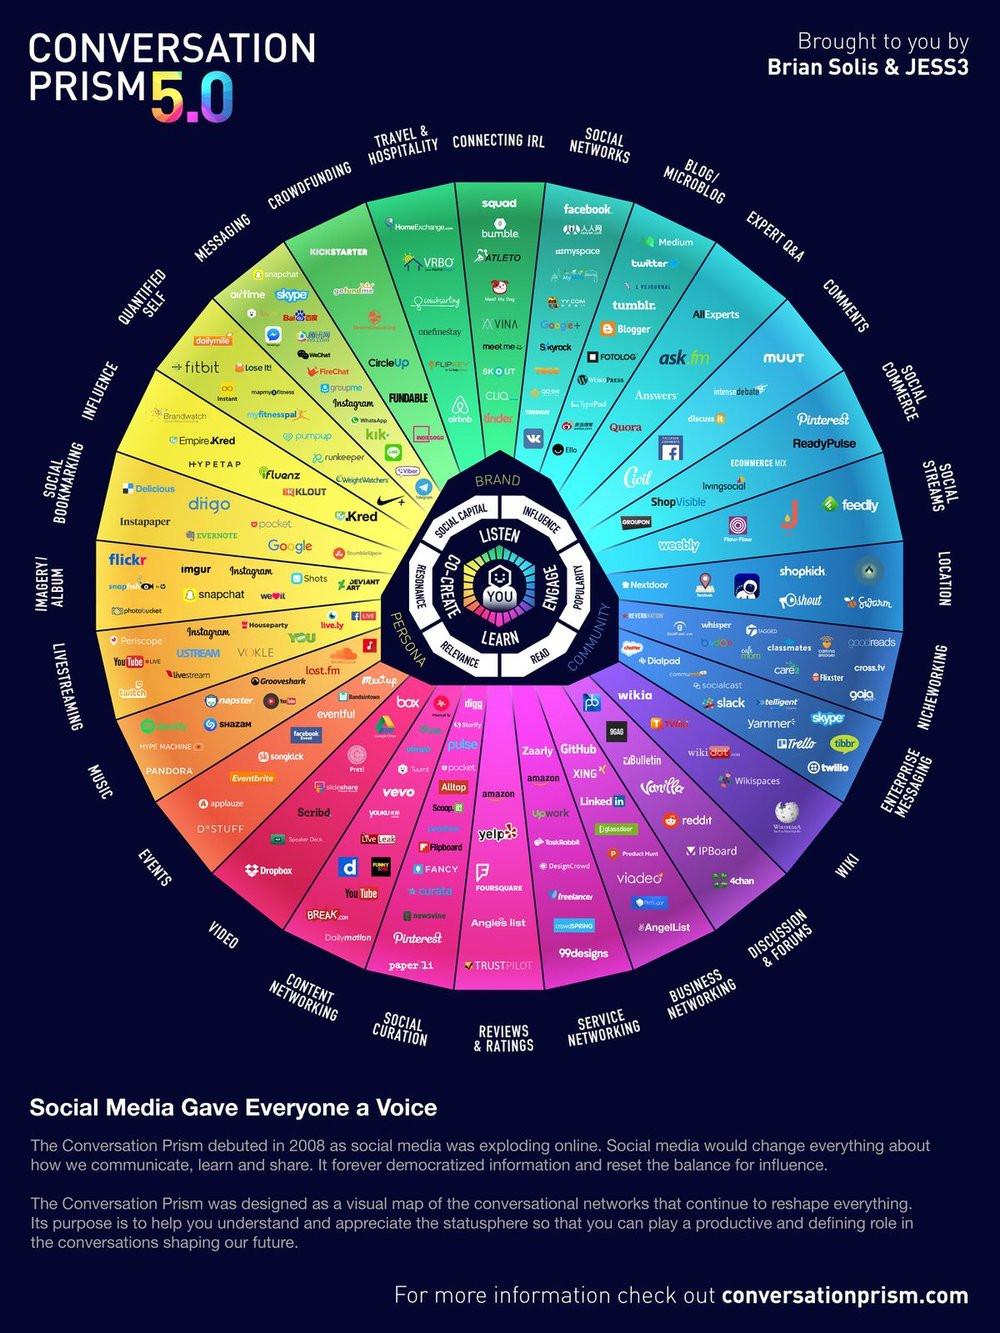 conversation-prism-influencers